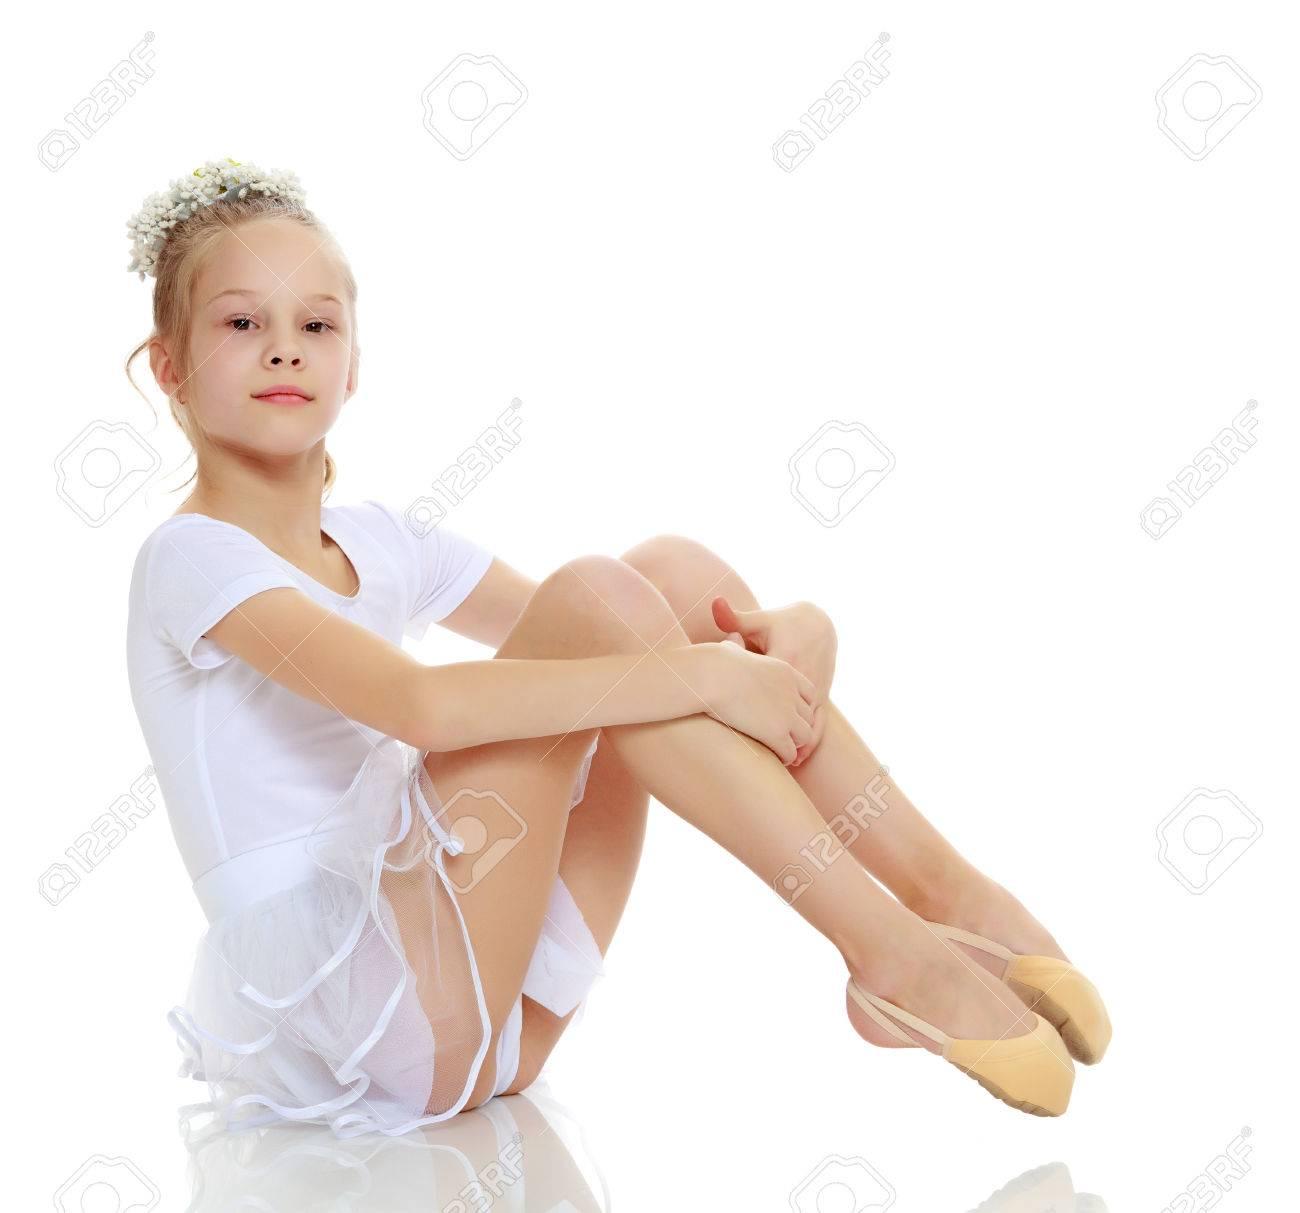 Girl gymnast posing sitting on the floor. - 75360861